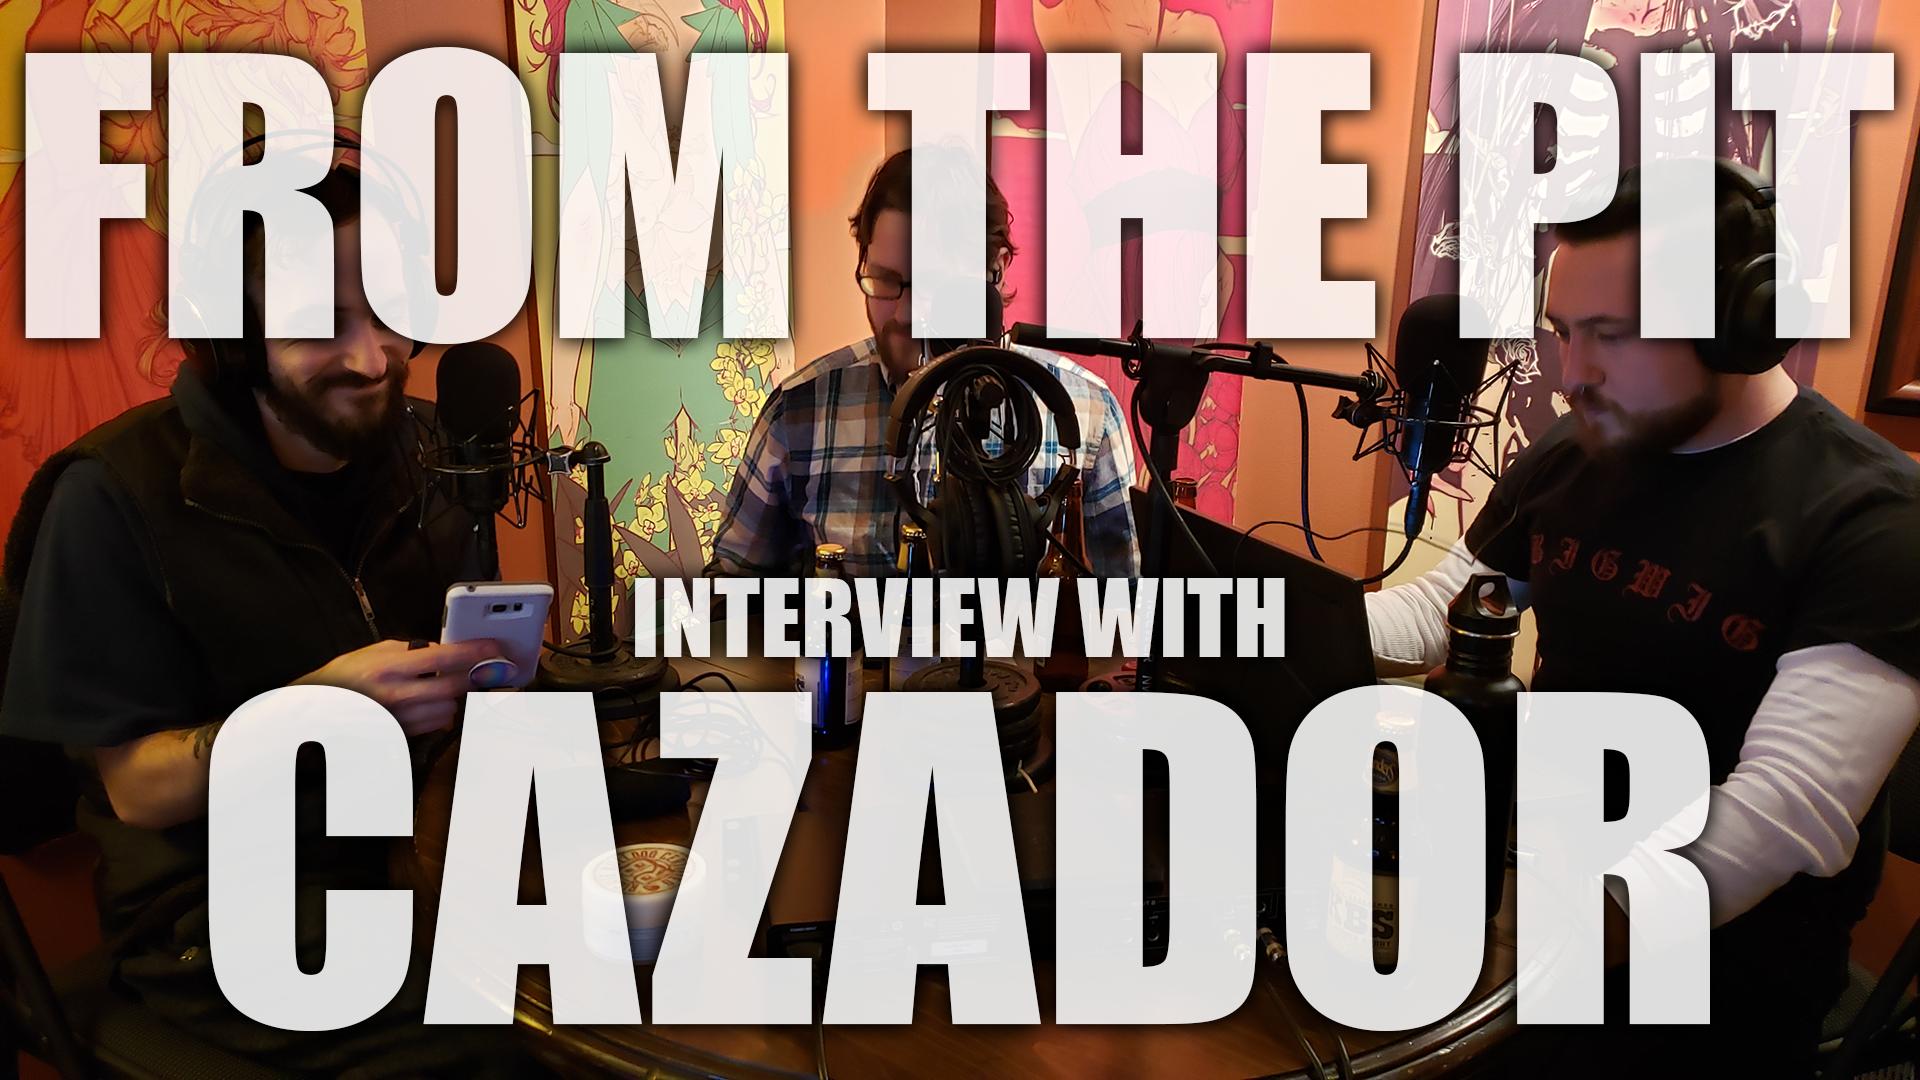 Talking With Joe Haryanto of Cazador